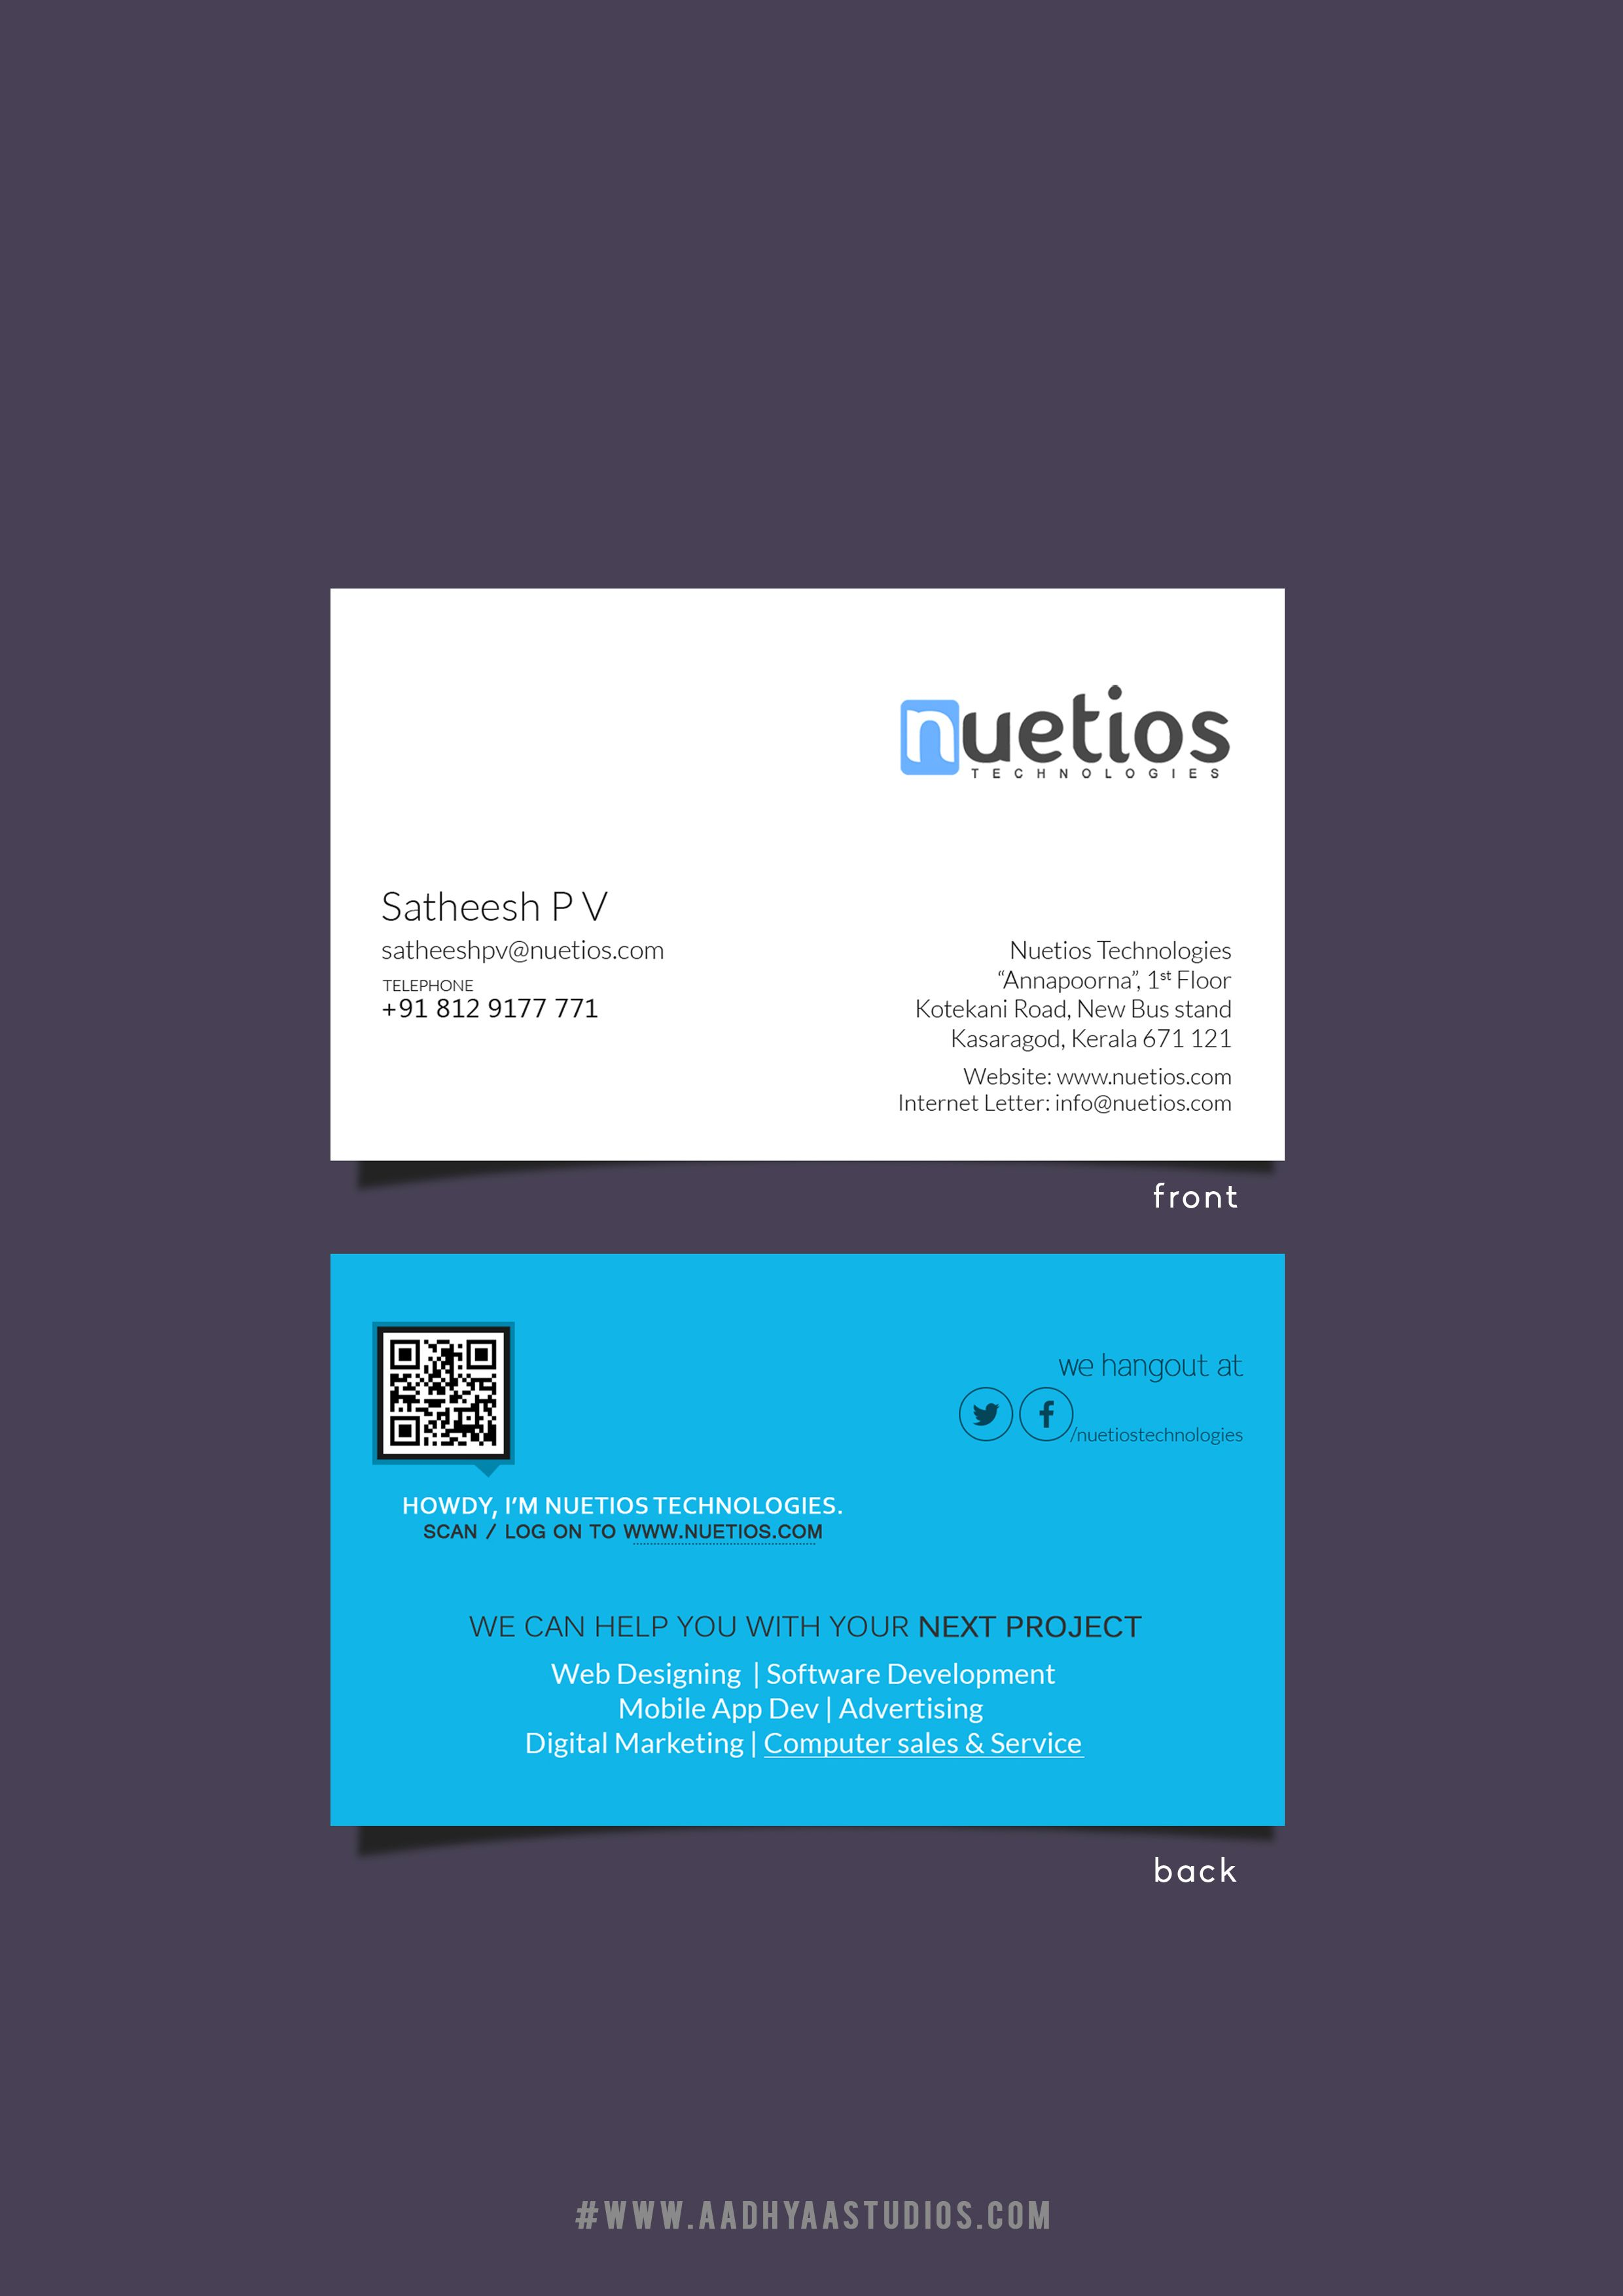 Visiting Card Design For Nuetios Technologies